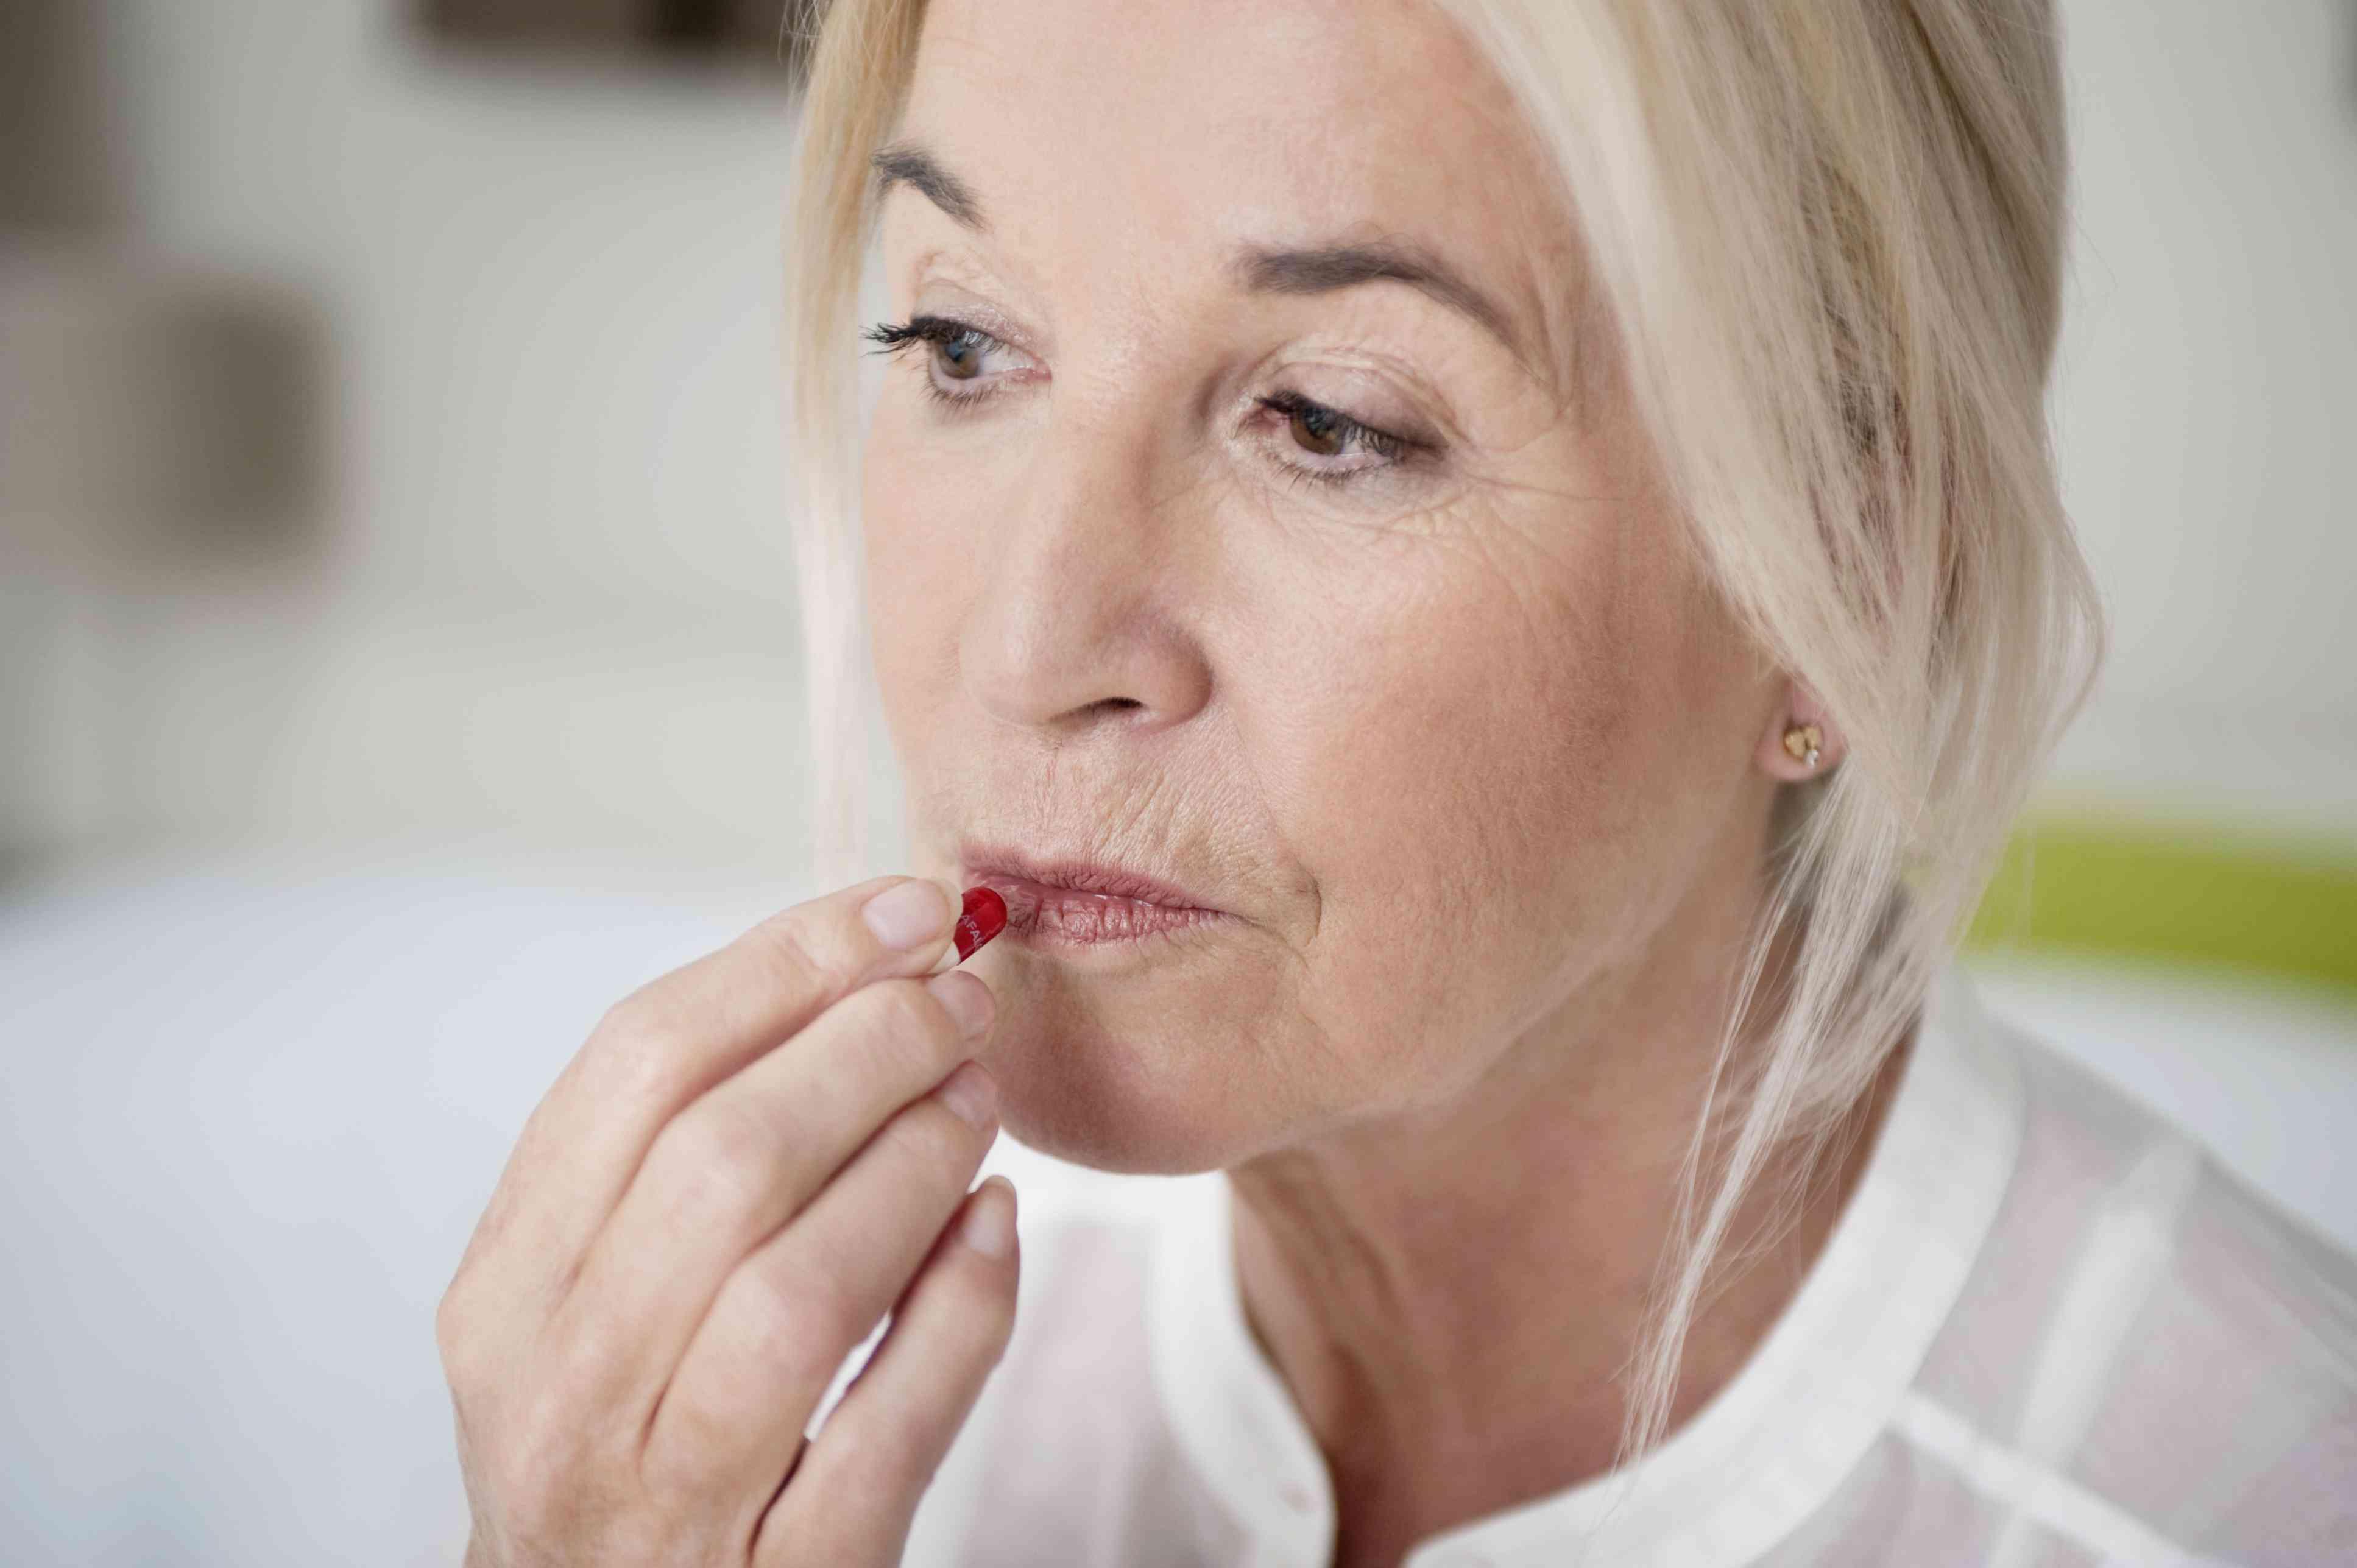 Woman about to take a pill